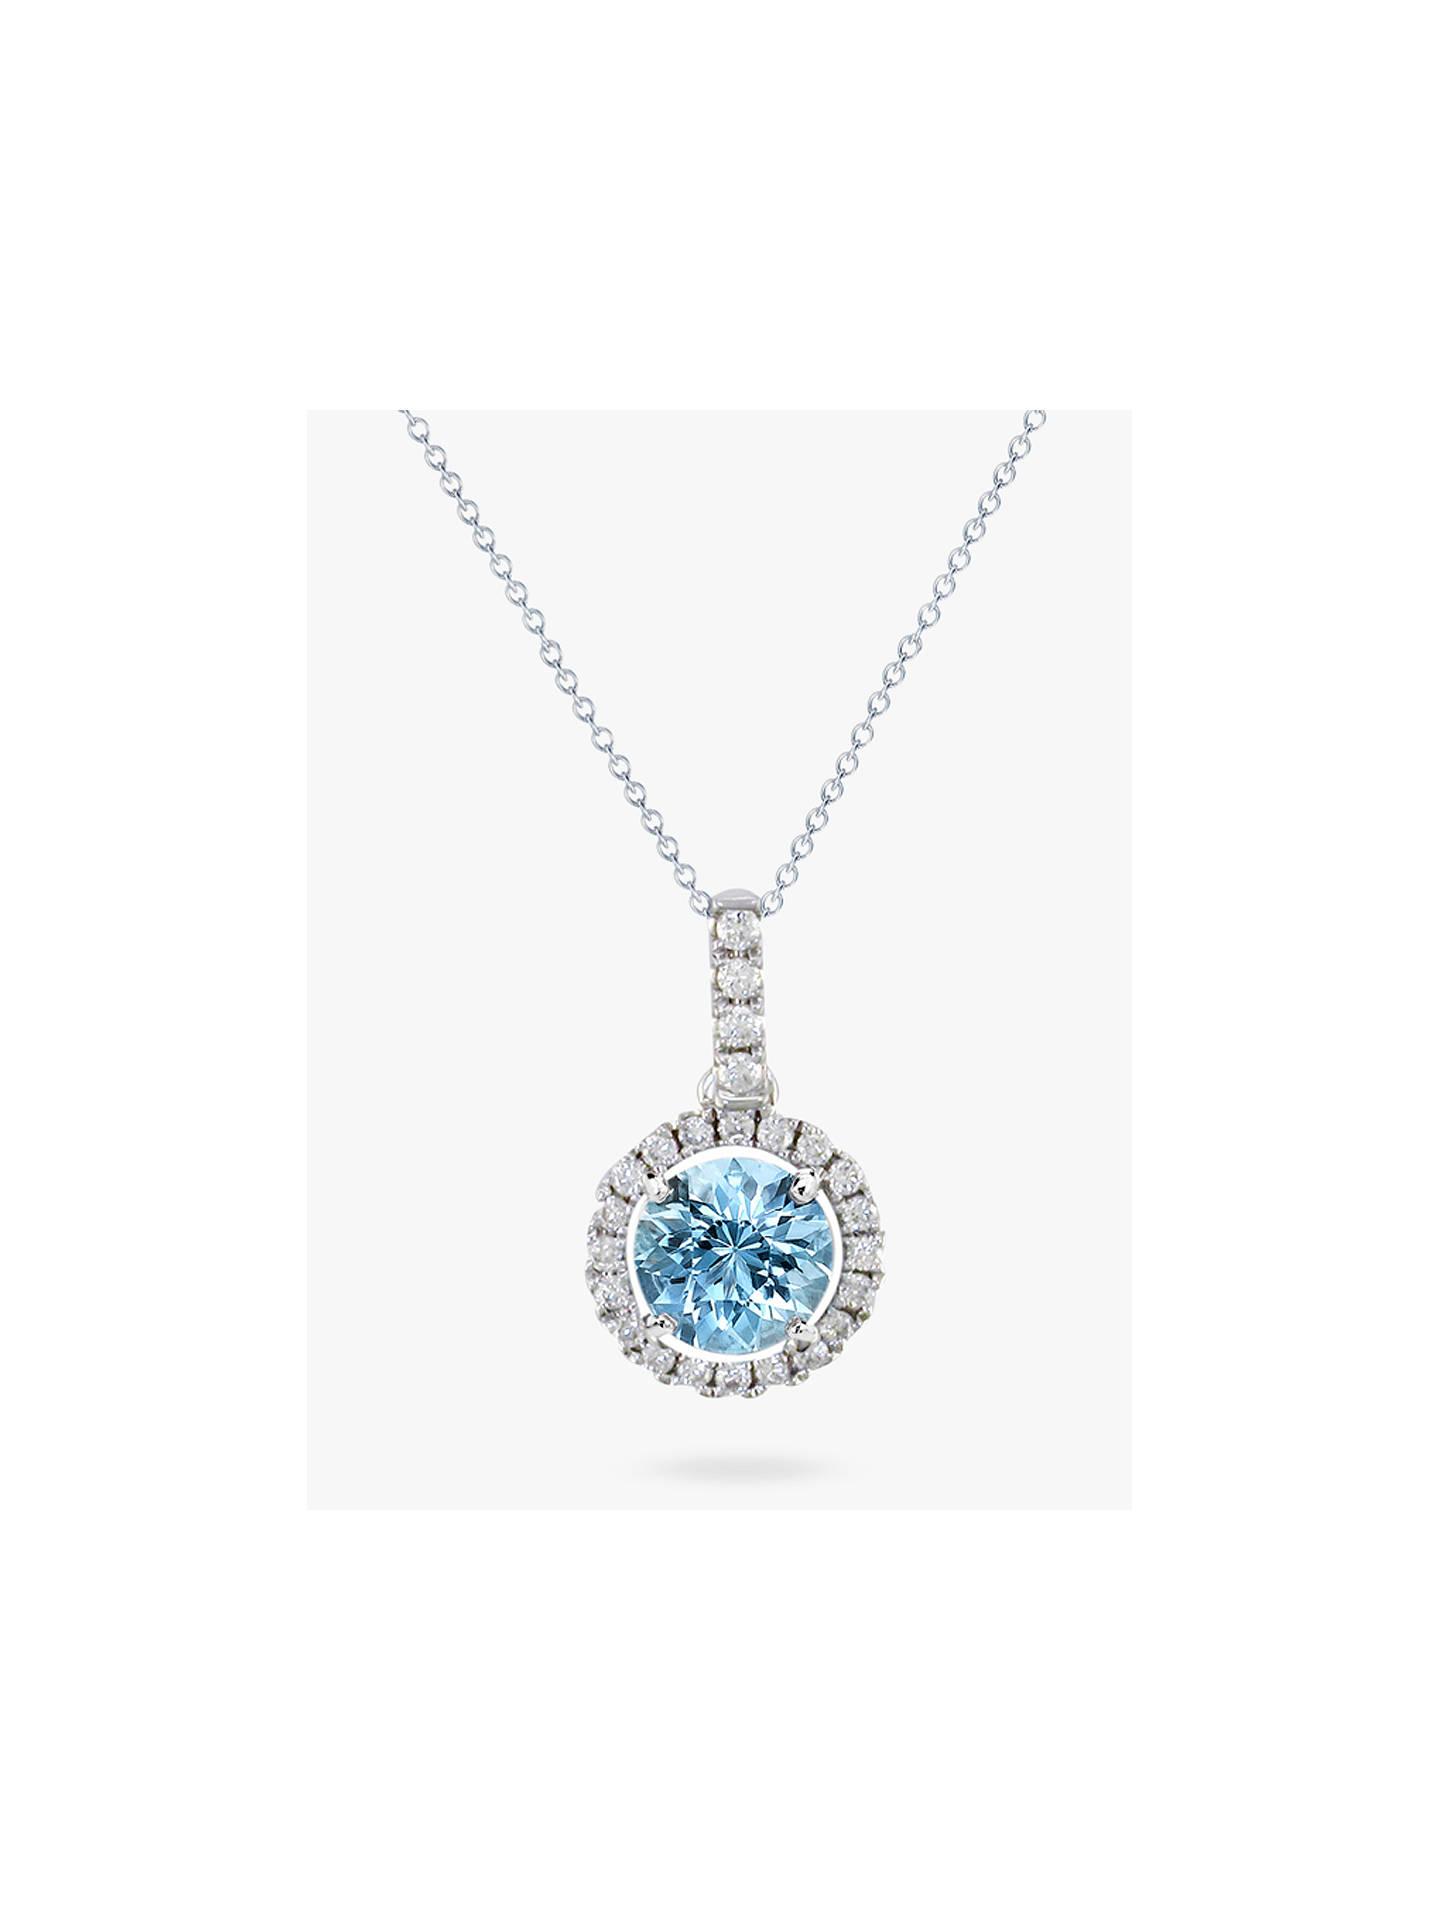 f27ee3fd3f6db8 Buy E.W Adams 18ct White Gold Diamond Cluster Pendant Necklace, Aquamarine Online  at johnlewis.